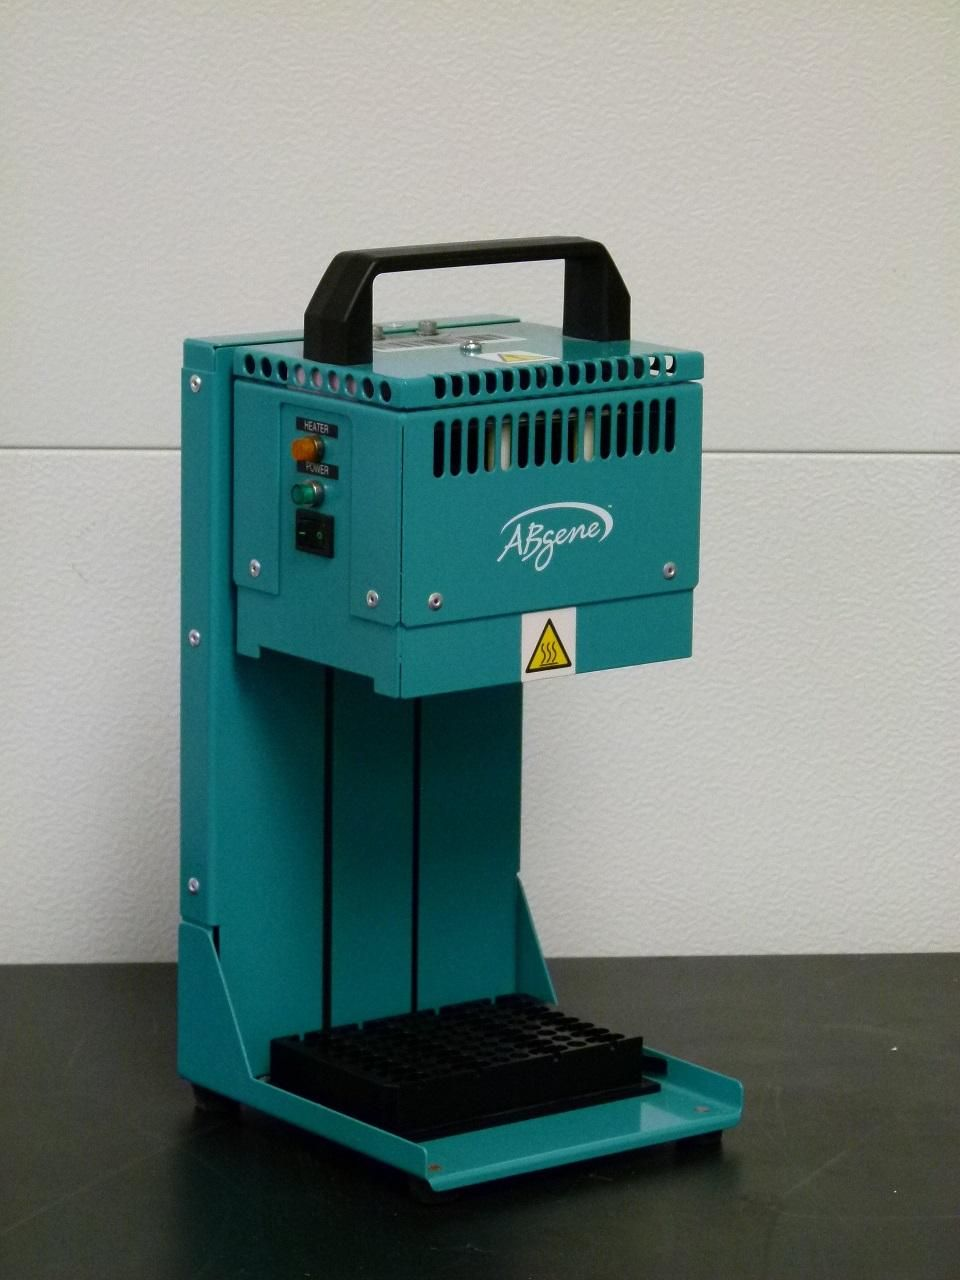 ~ ABgene Combi Thermo-Sealer Micro Plate Sealer